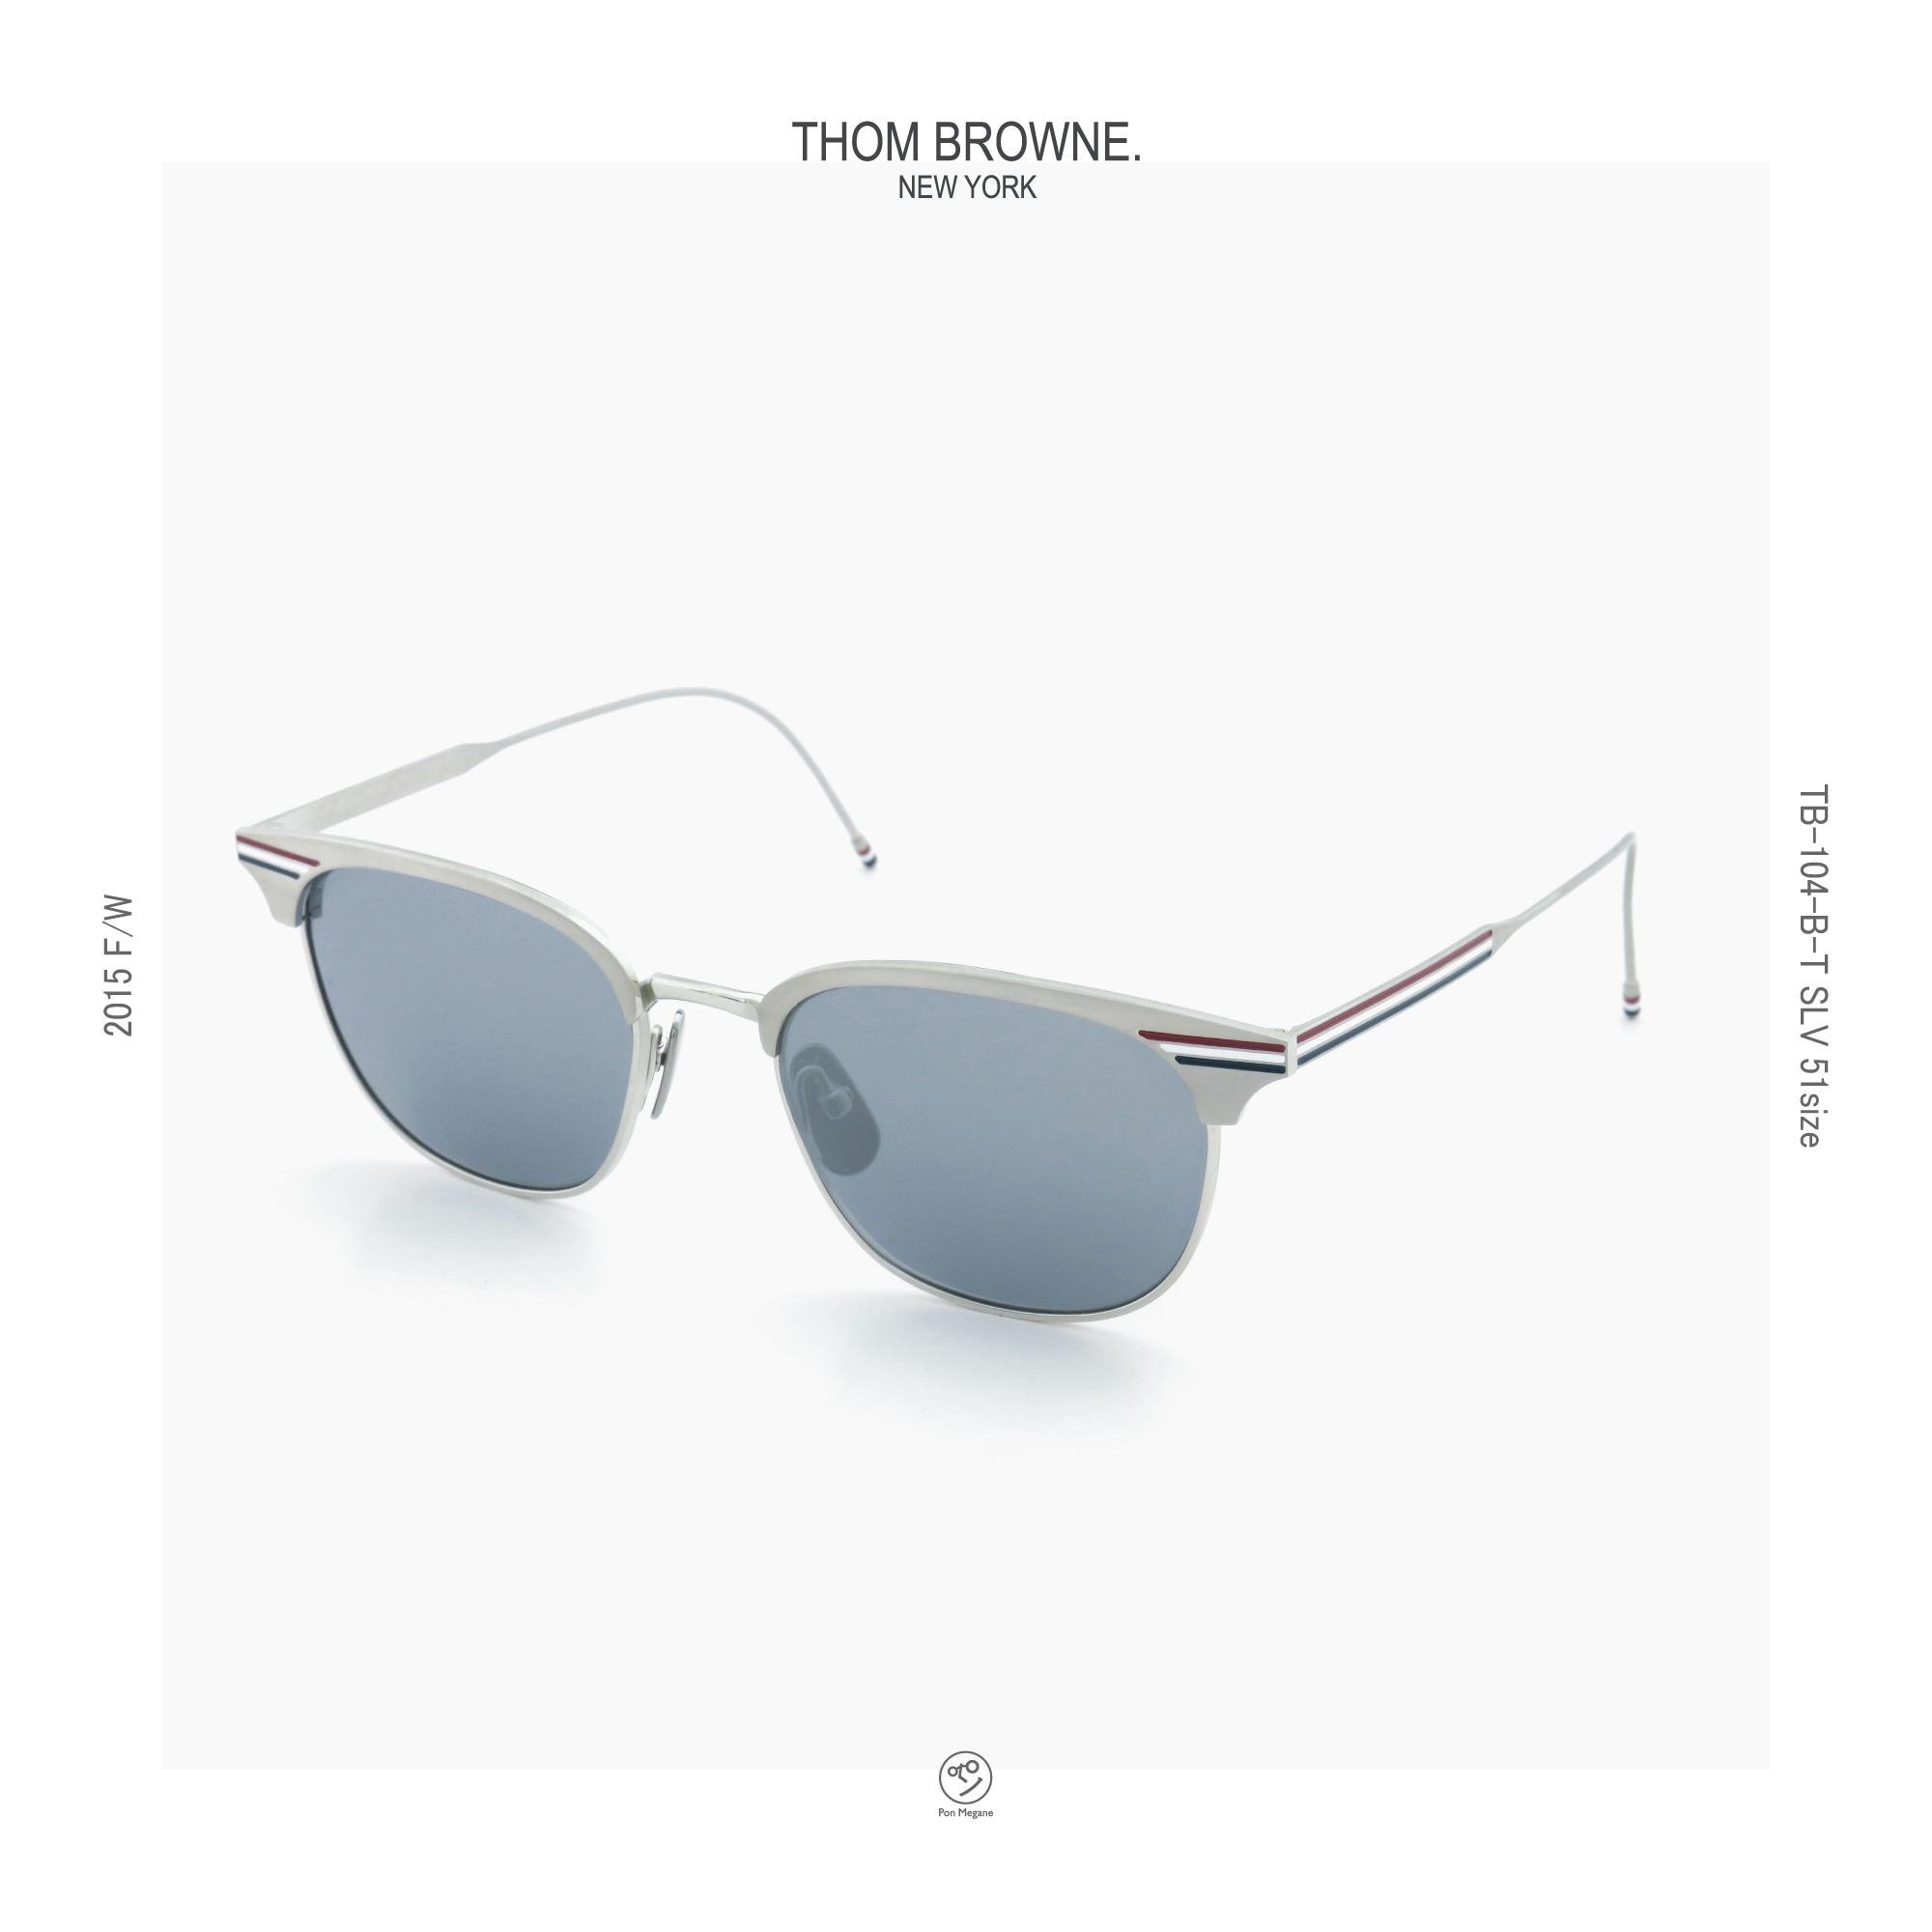 THOM-BROWNE-TB-104-B-T-SLV-51-insta